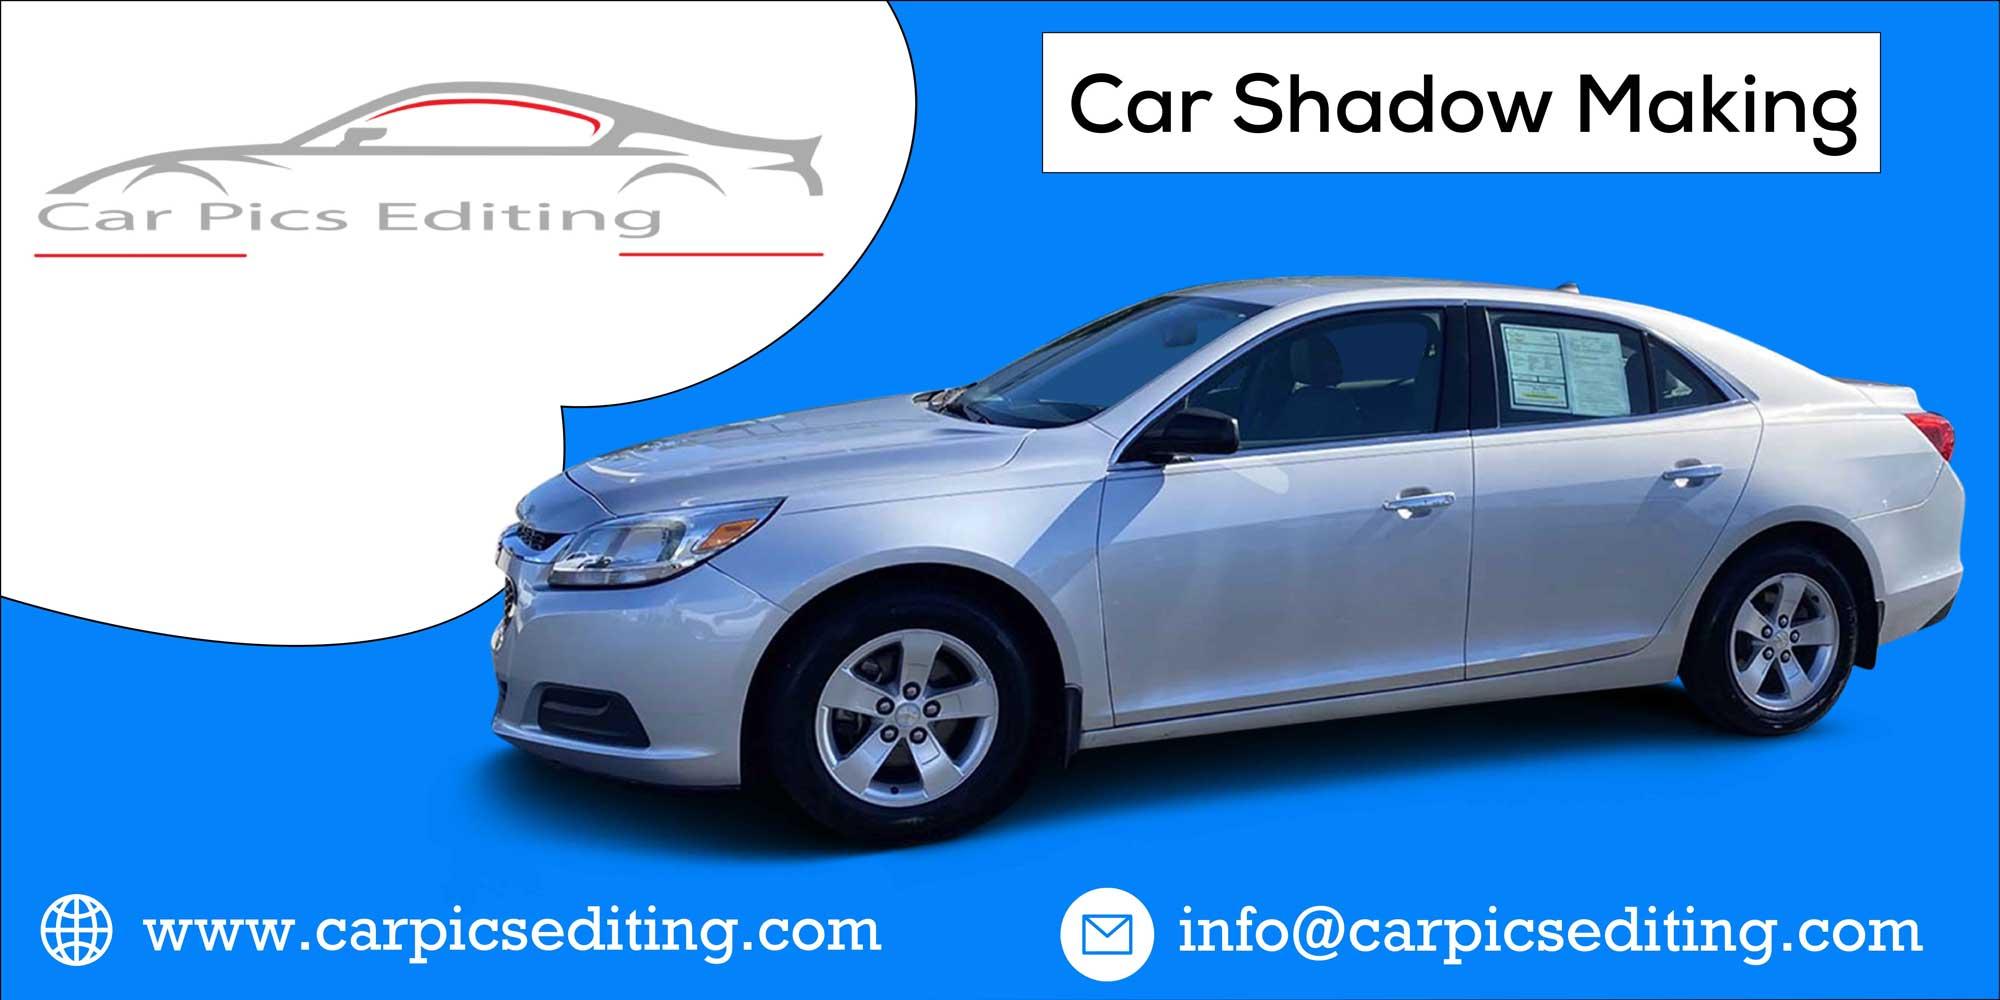 Ways Car Shadow Making Can Make You Invincible 3